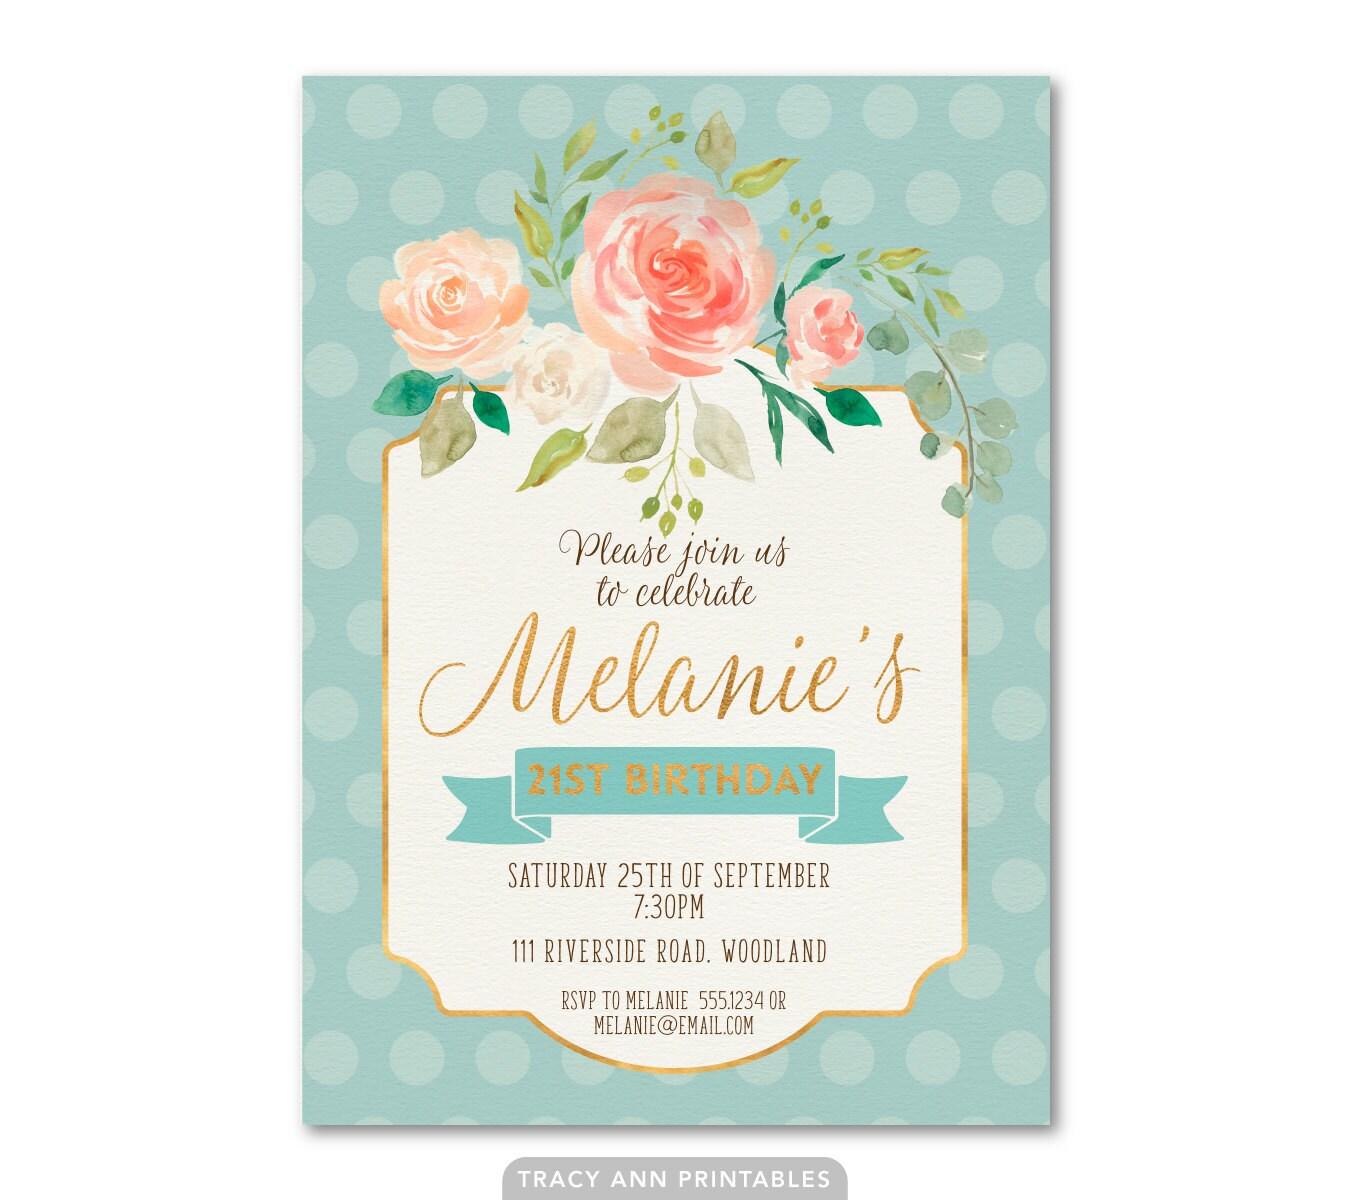 21st Birthday Invitation, Floral Blue Birthday Invite, Vintage Style ...